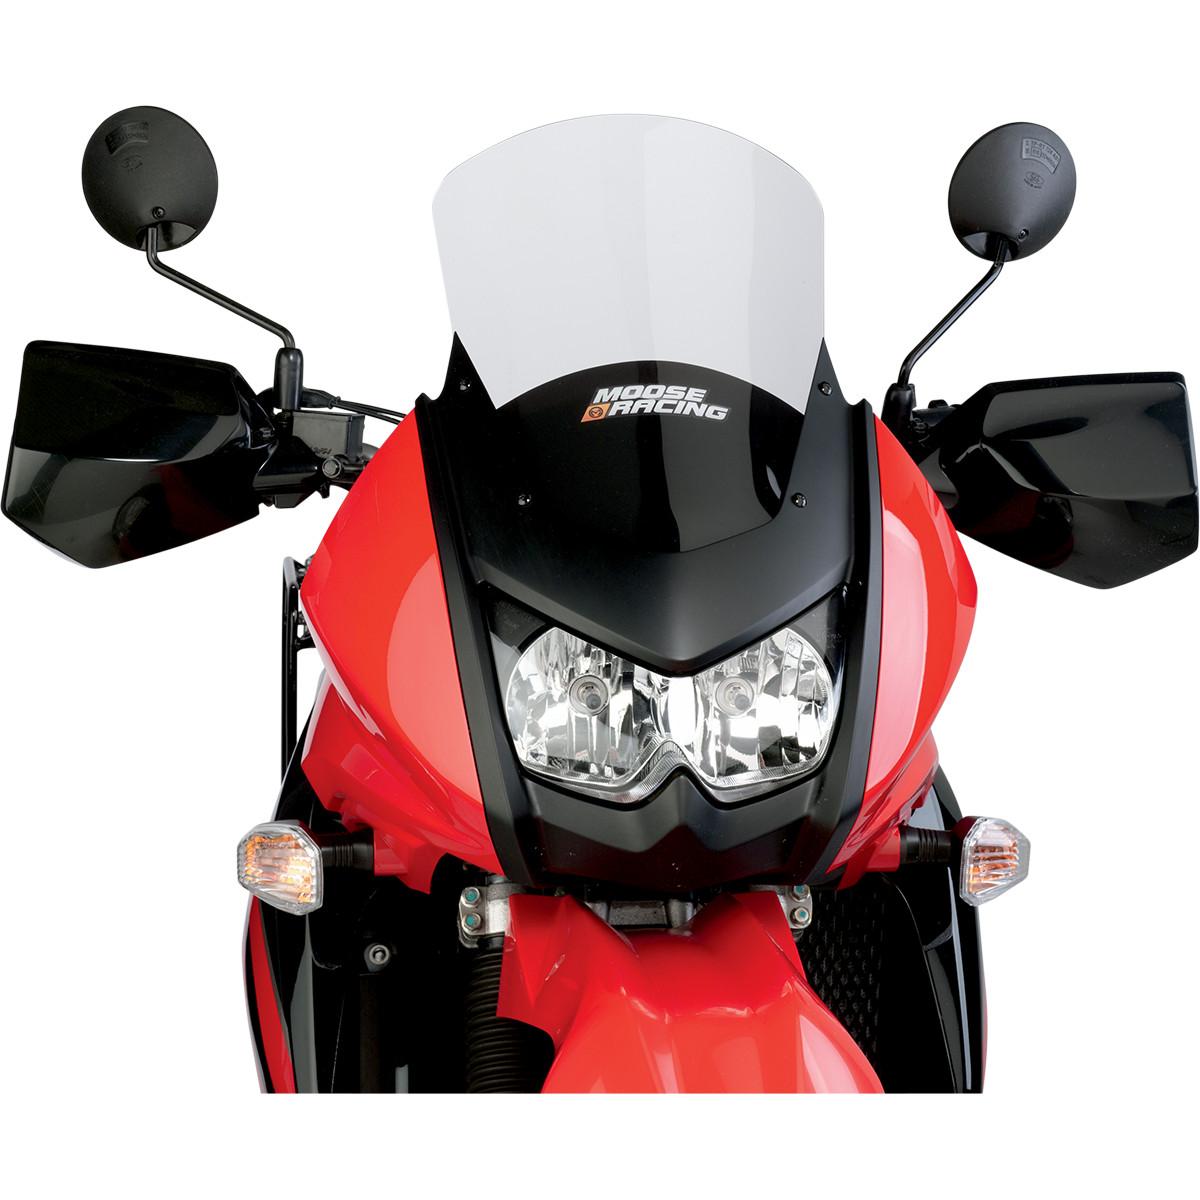 "Moose Racing Adventure Windscreen +4"" Clear With Silkscreen Fits 08-14 Kawasaki KLR650"